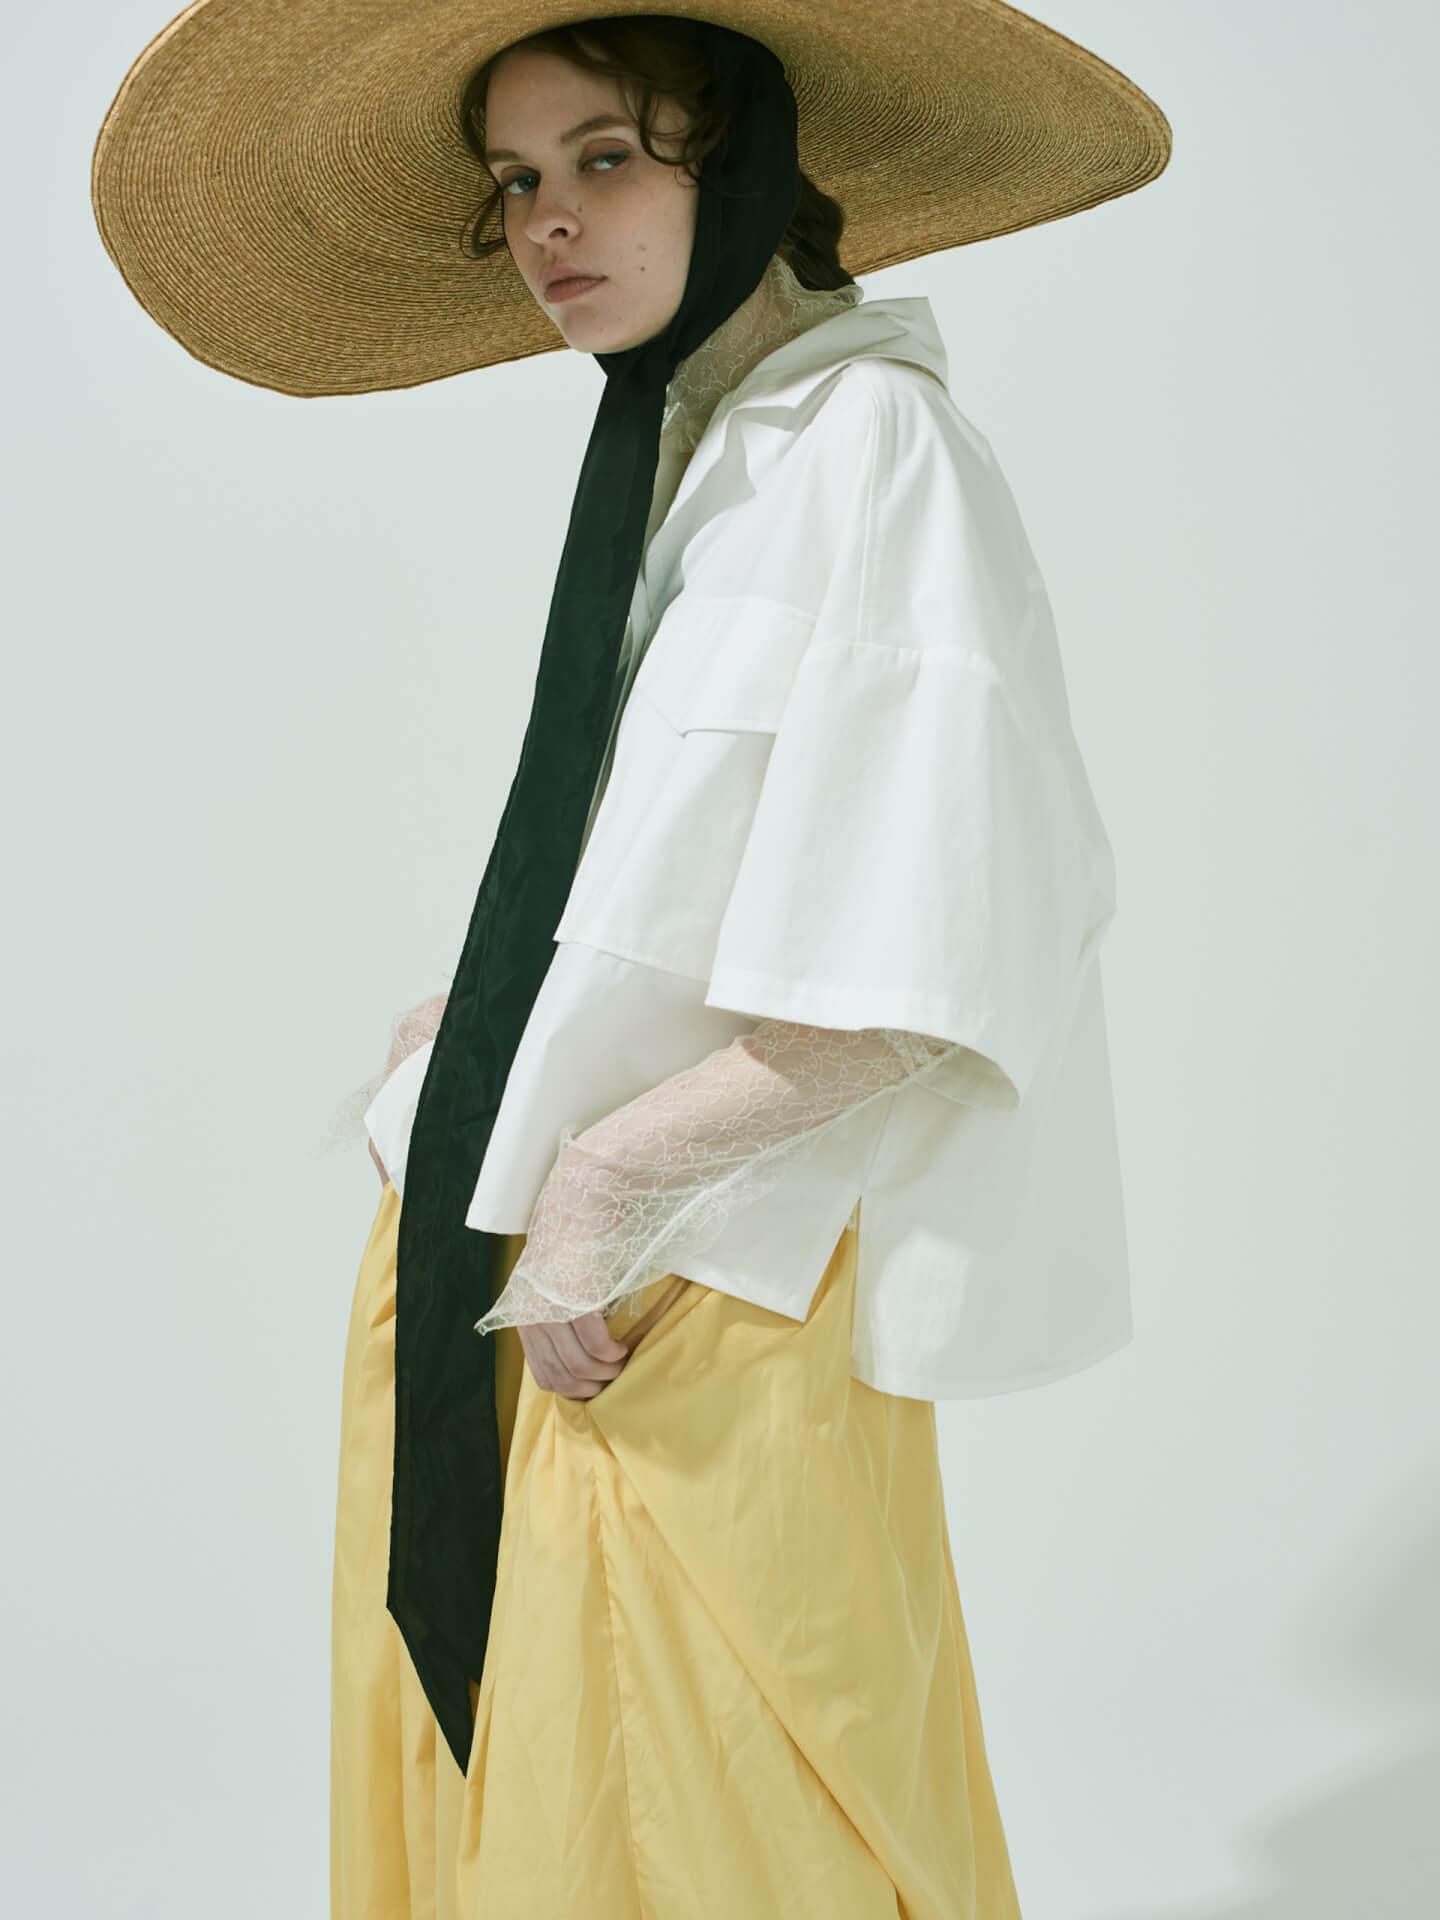 CHAIのベーシスト・YUUKIによるプロジェクト「YMYM」よりファッションブランドオープン!2021年春夏コレクション&描き下ろし絵画などの展示会も life210405_ymym_6